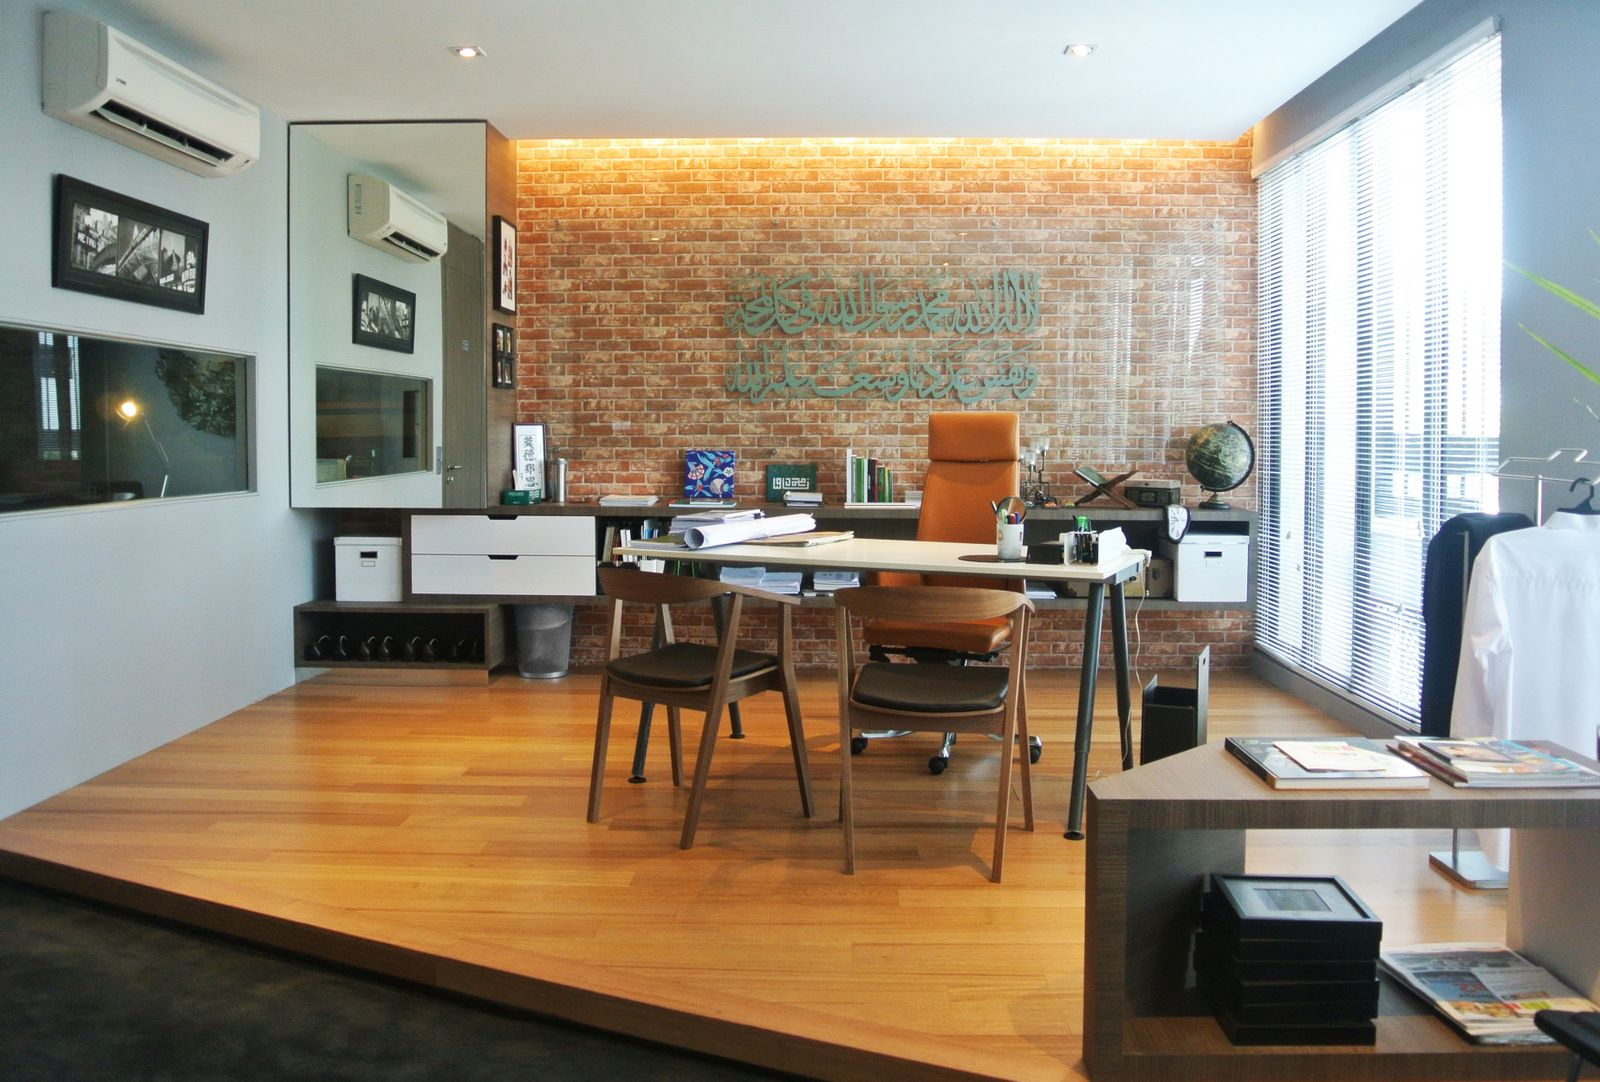 office tour skala design consult kuala lumpur offices - Kcheninnovationen Inkl